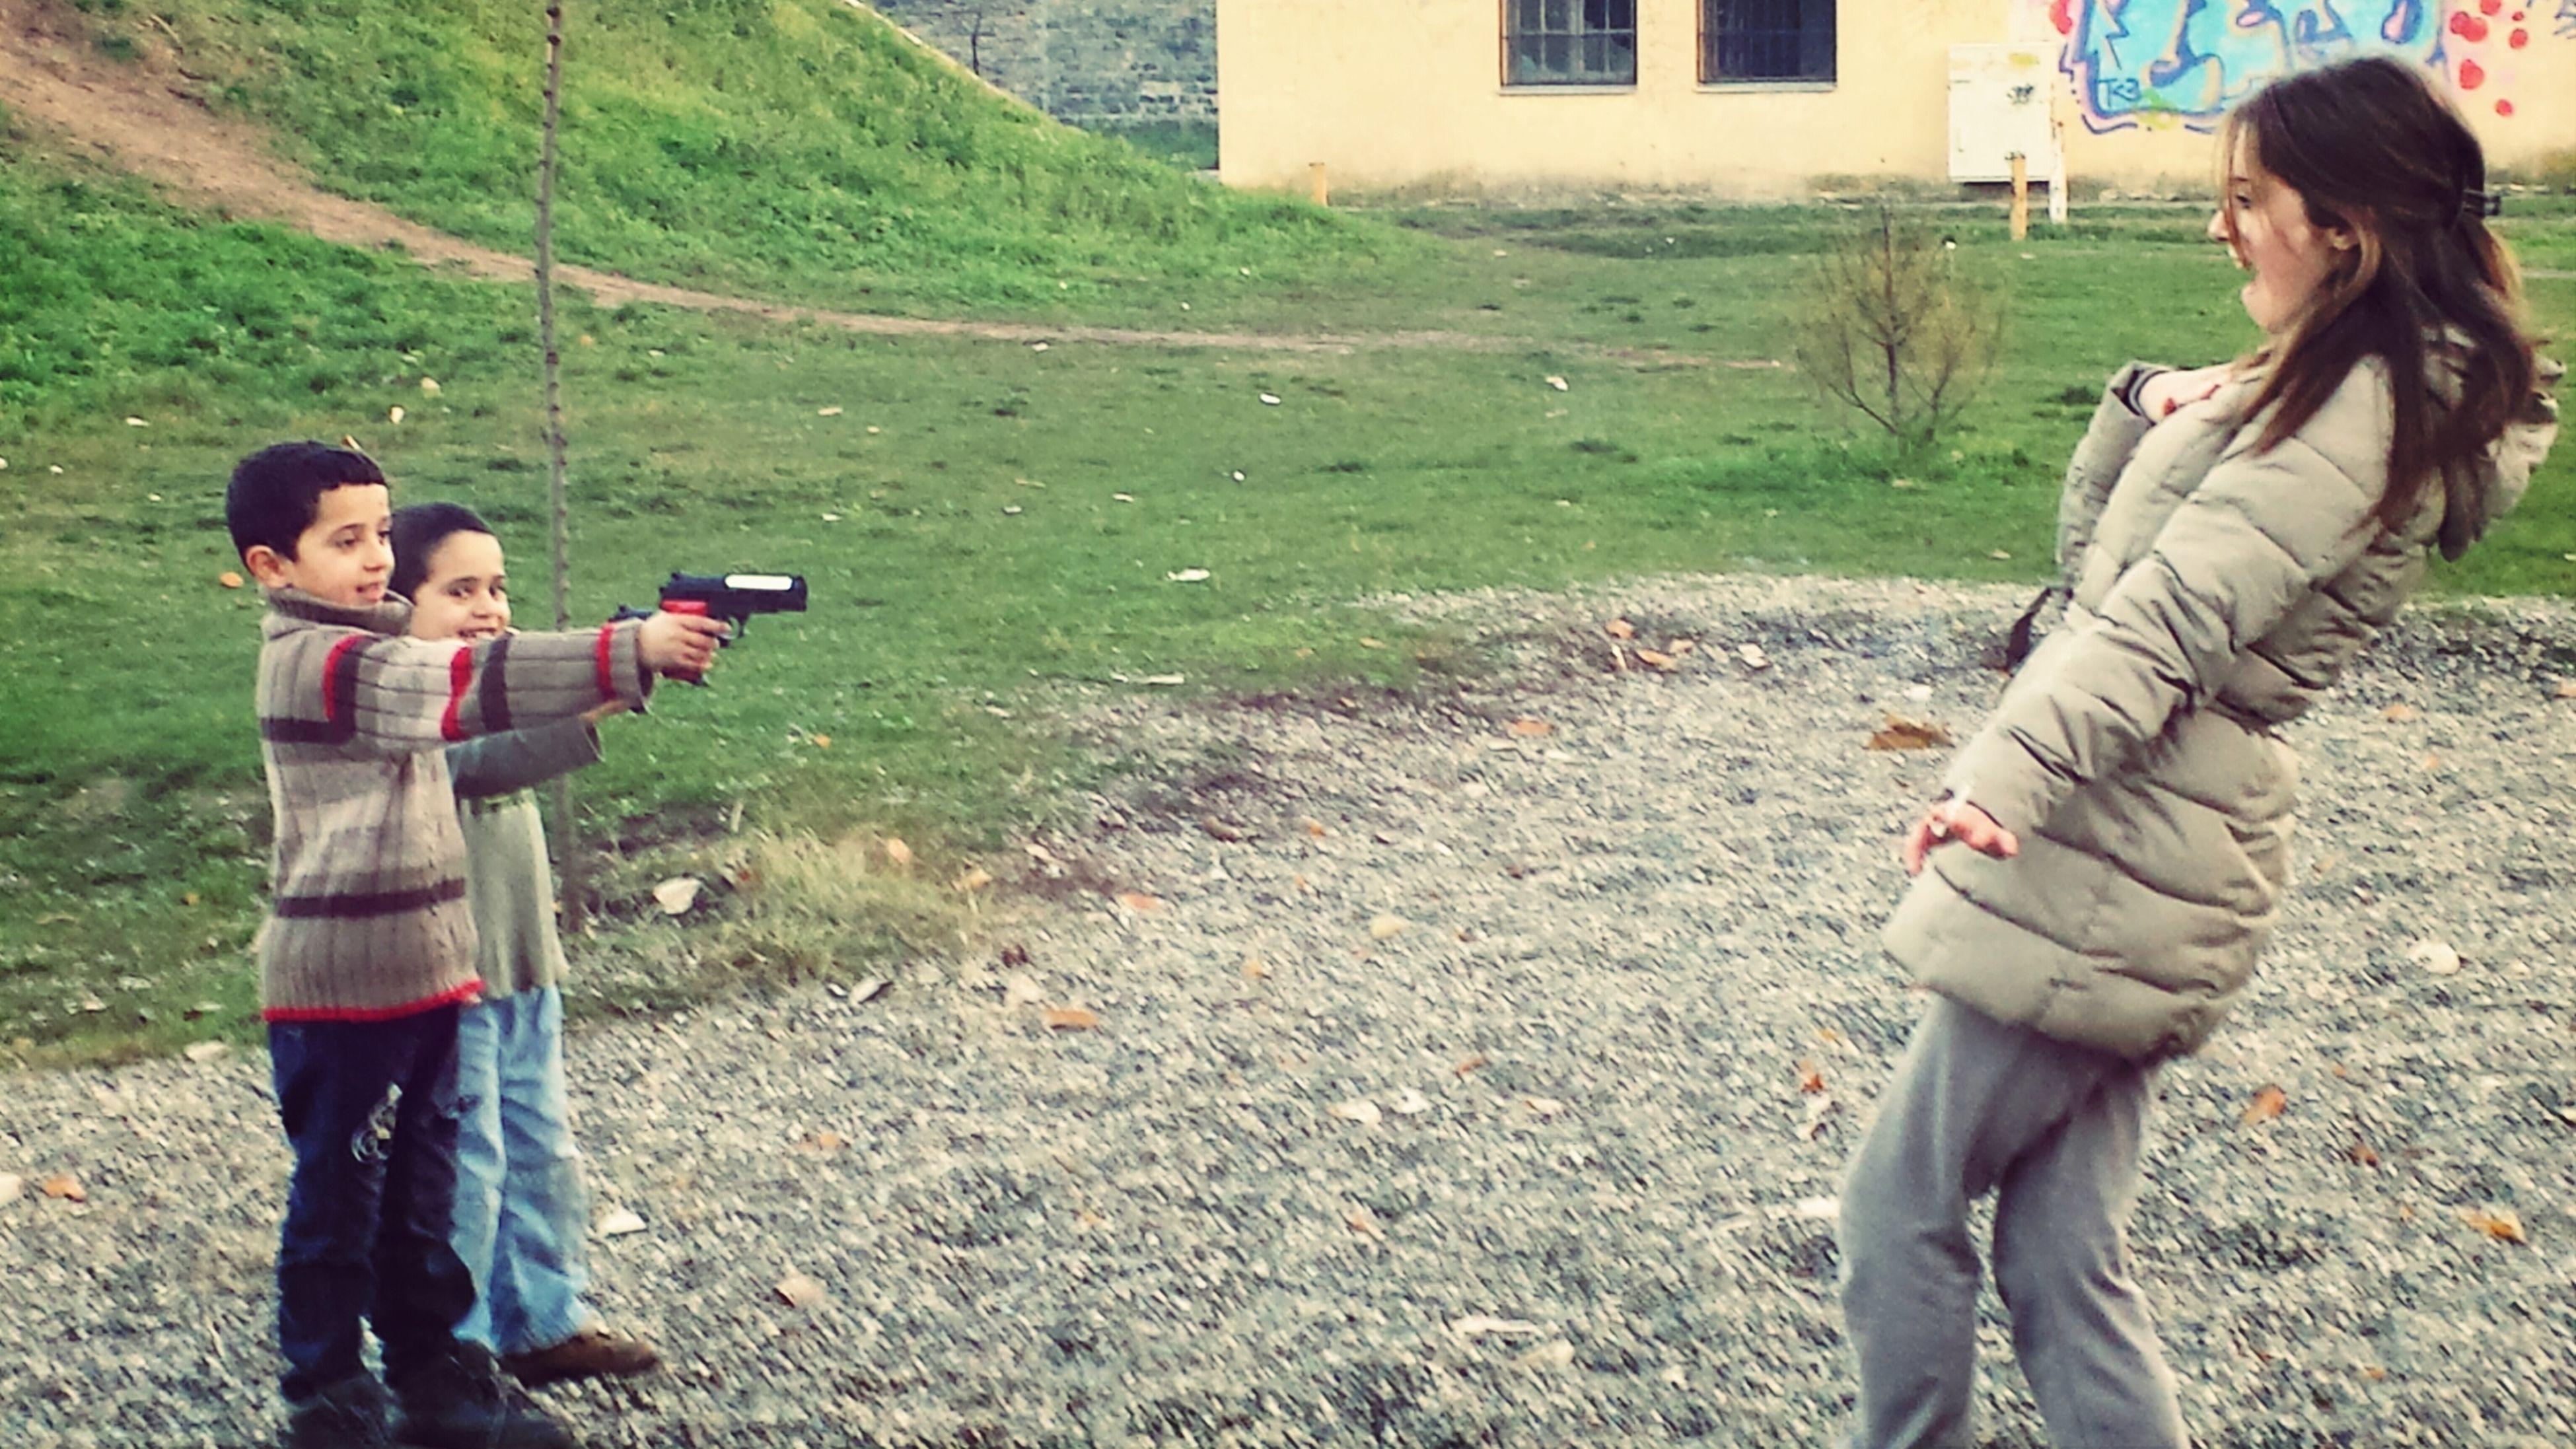 Preparing For Movie Kids Guns Spontaneous